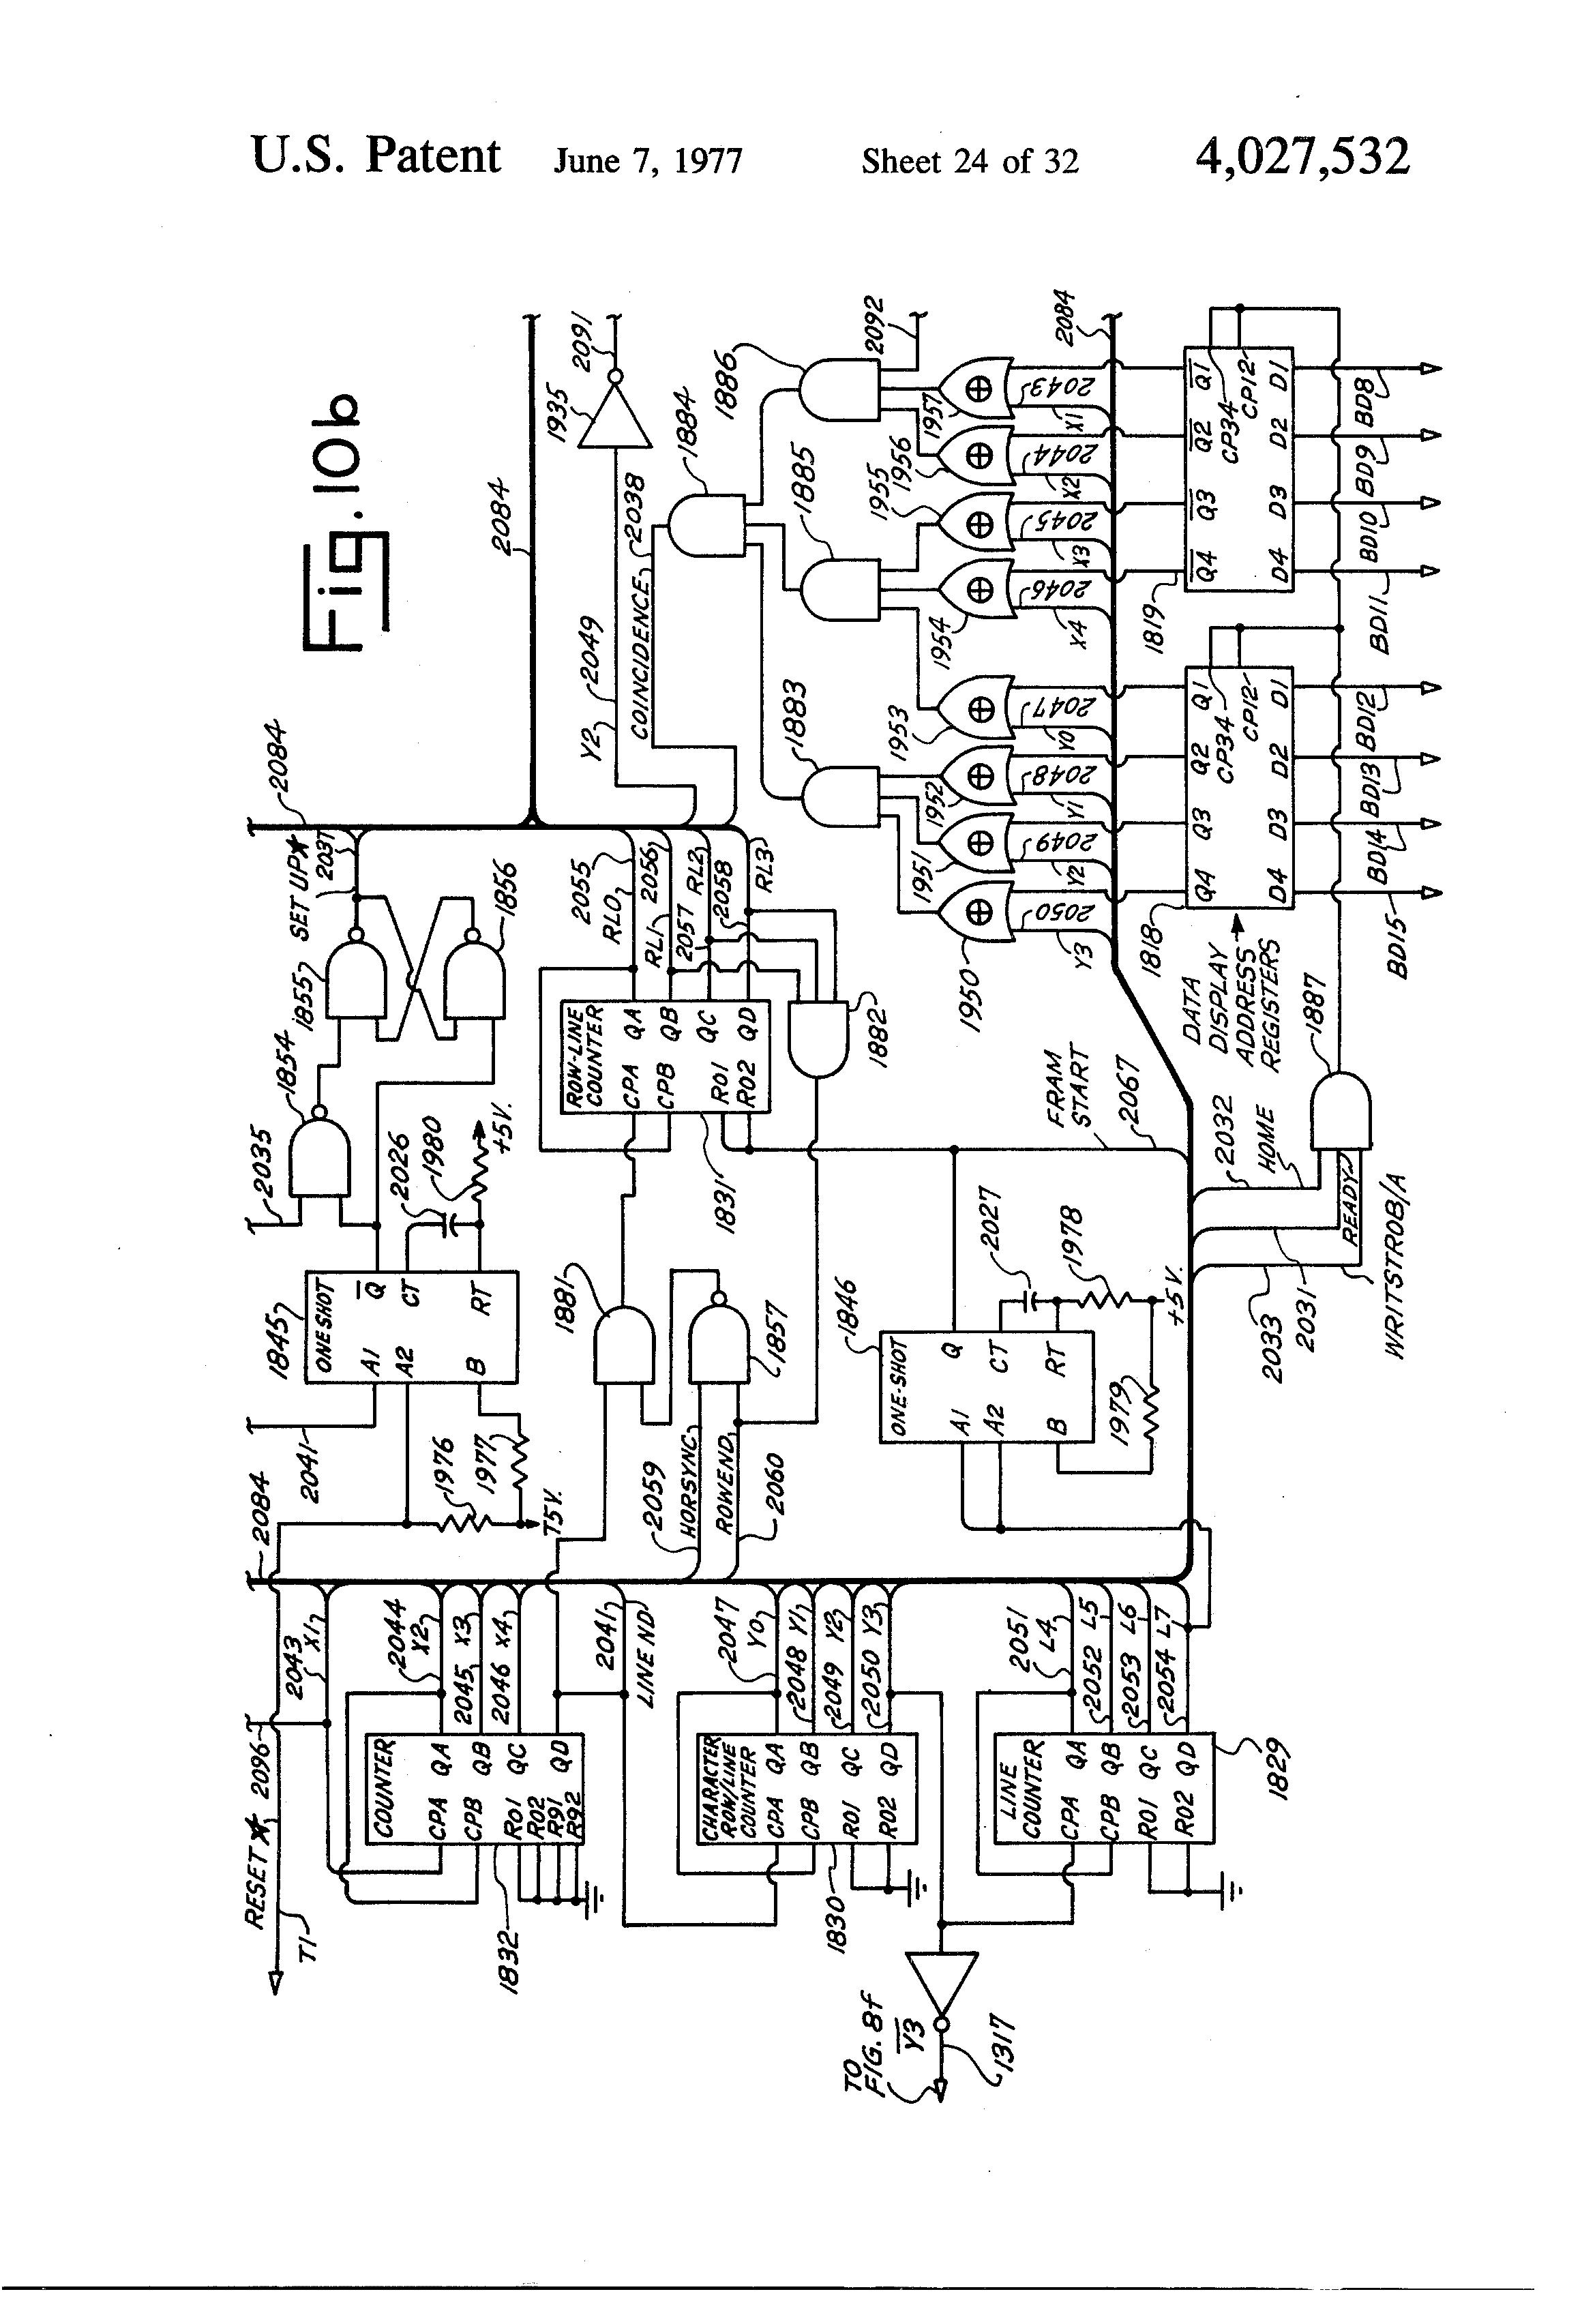 1992 Lexus Sc300 Fuse Box Diagram Schematics Wiring Diagrams For 1995 Es300 1993